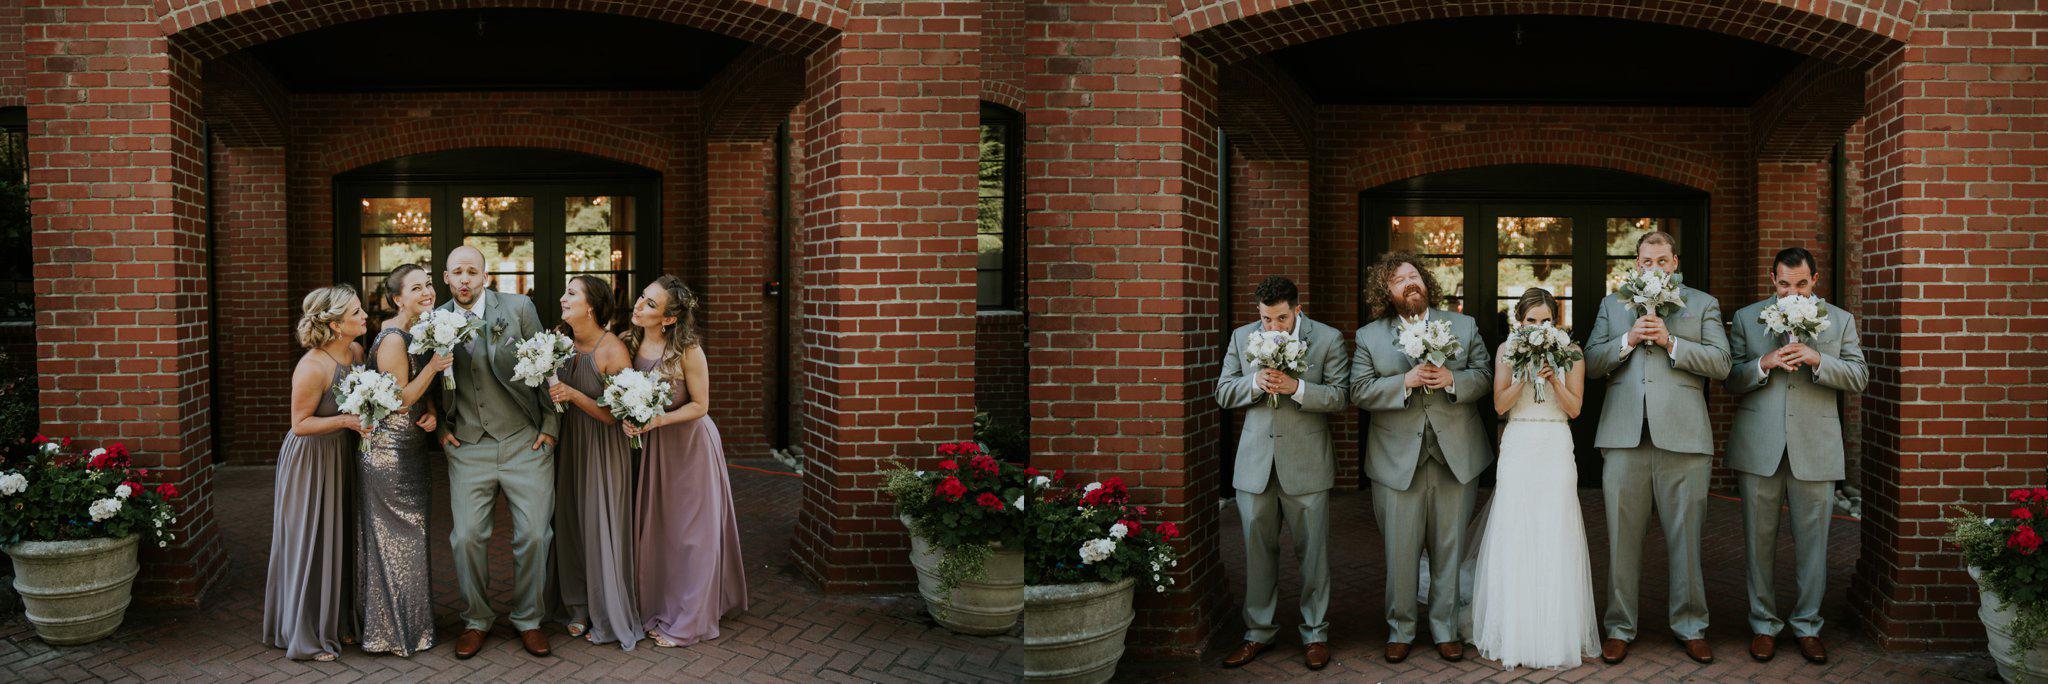 hollywood-school-house-wedding-seattle-photographer-caitlyn-nikula-60.jpg